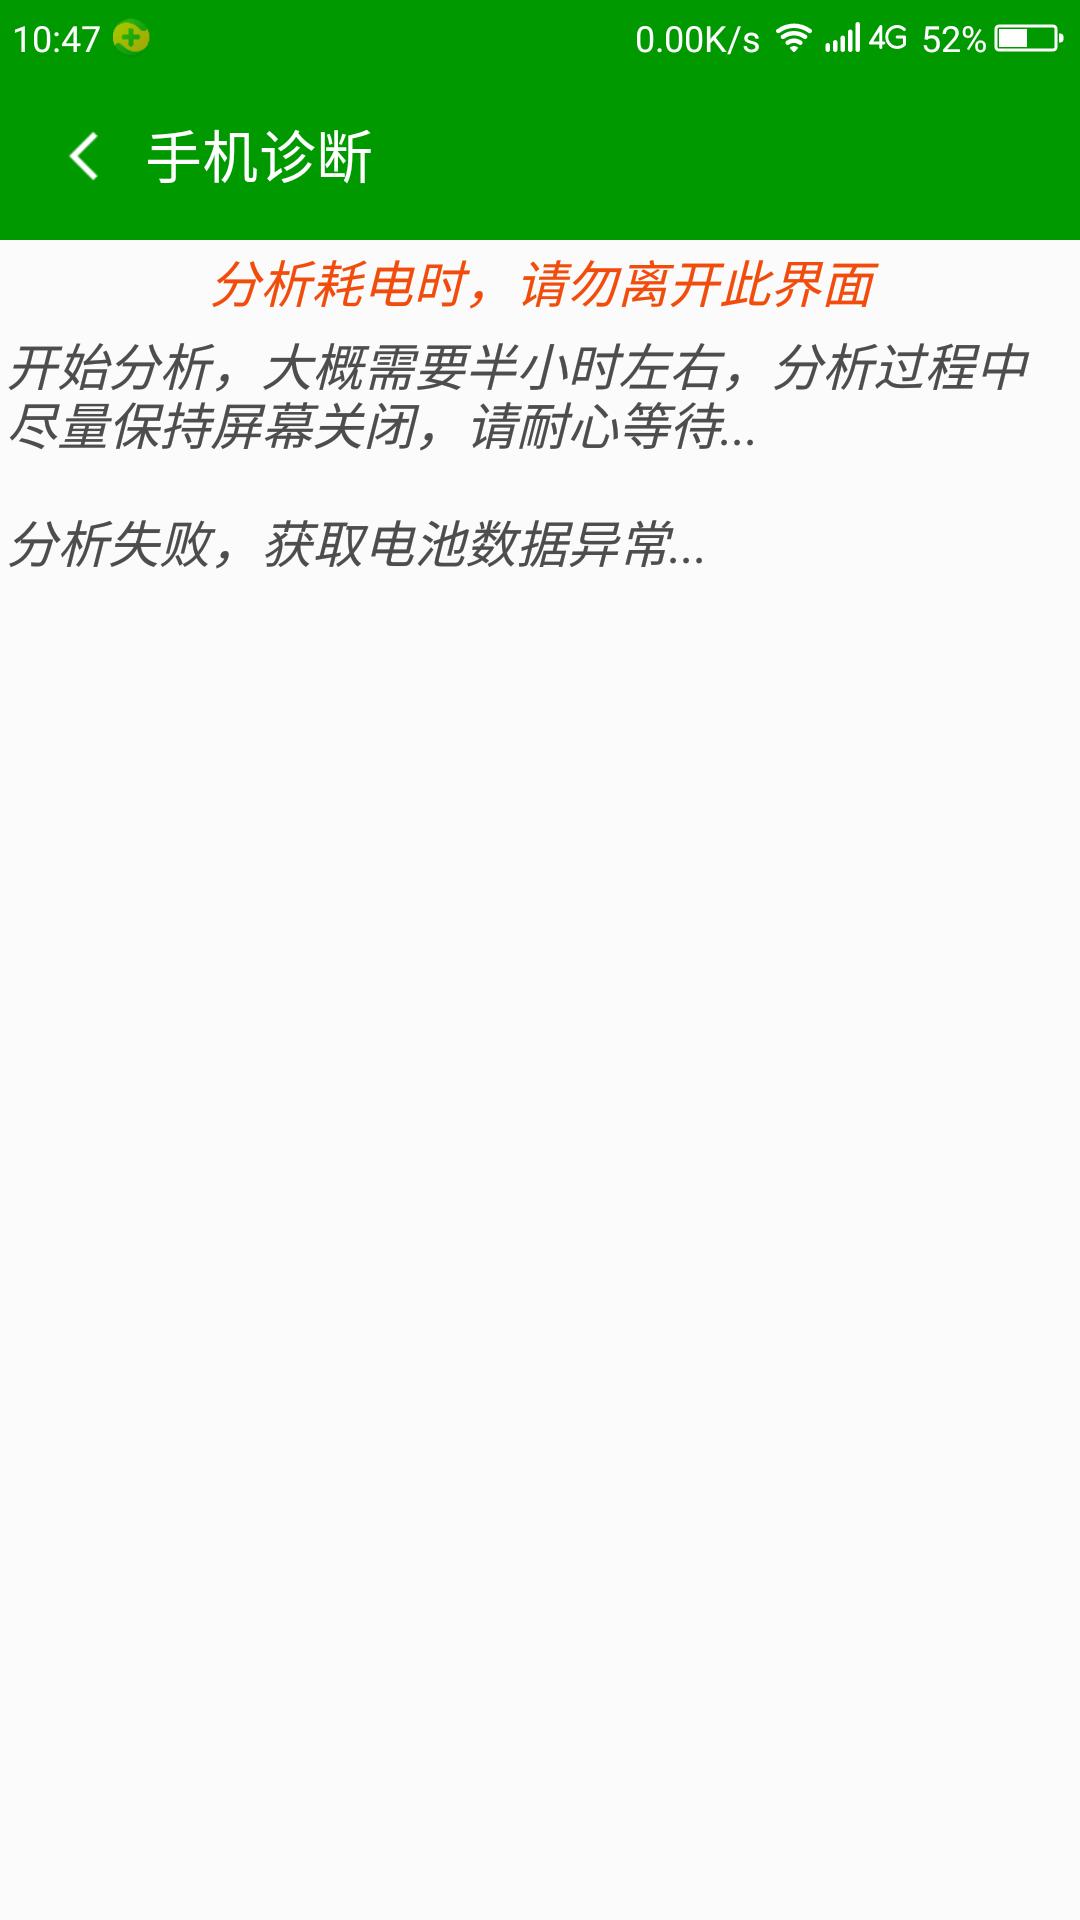 Screenshot_2016-06-22-10-47-09.png